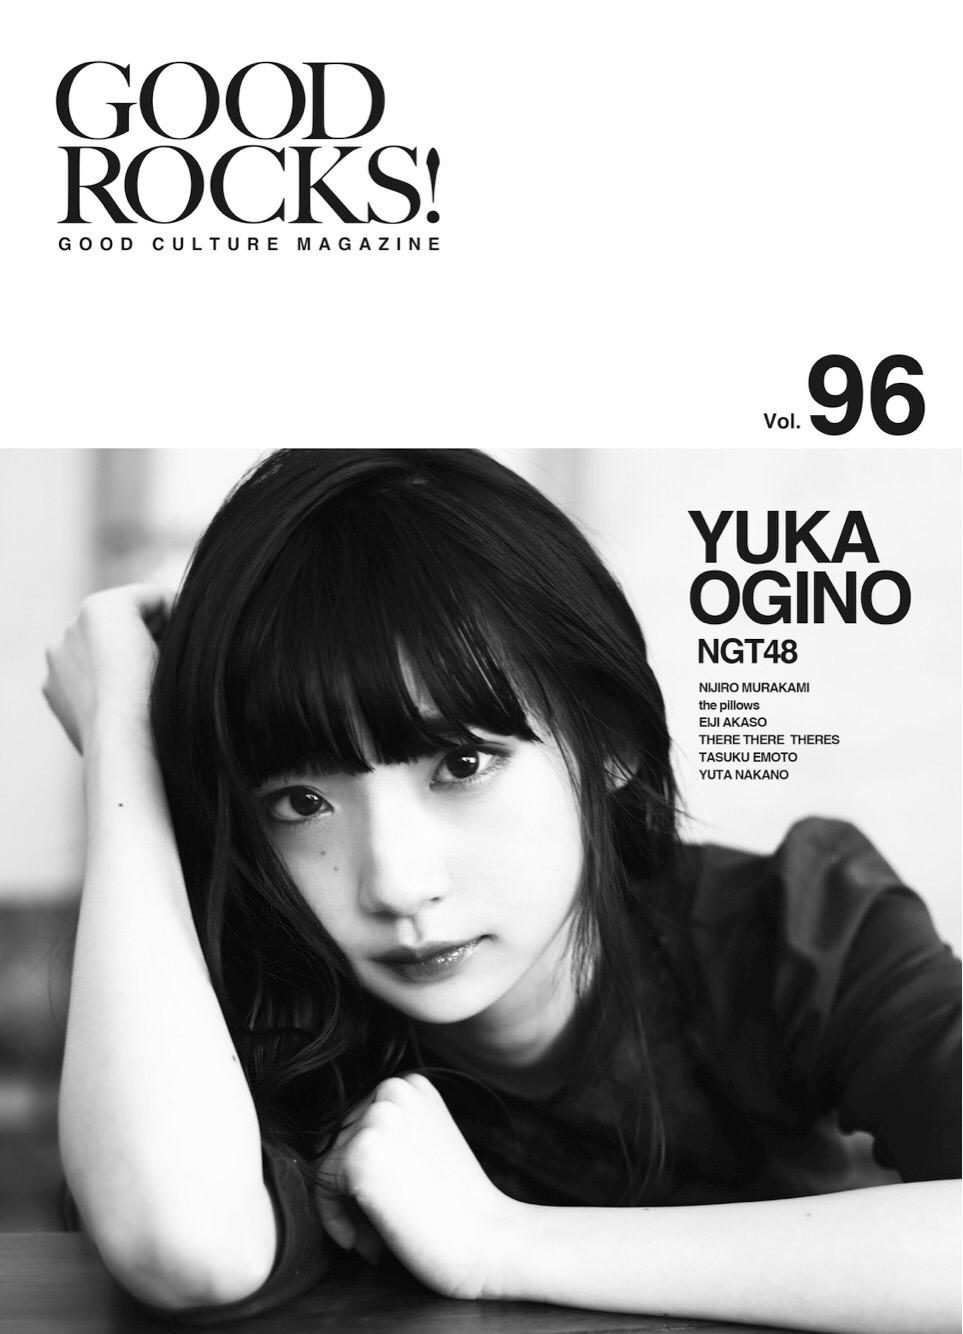 NGT48荻野由佳がモノトーン写真で魅せる「GOODROCKS!」の表紙に登場! 22ページの大特集